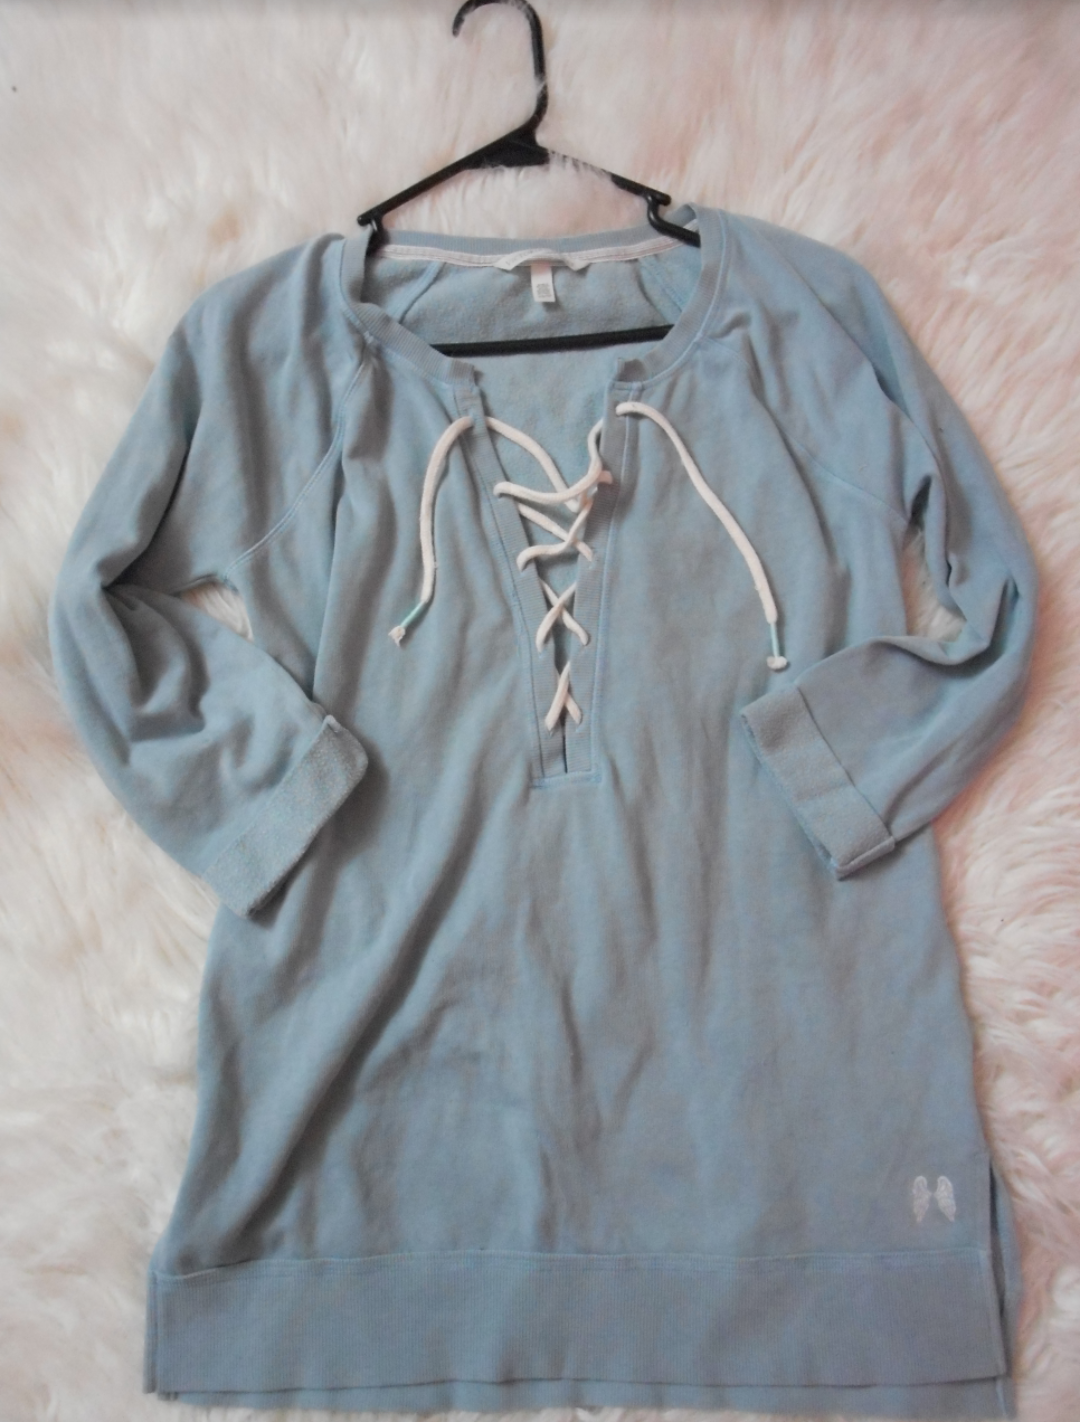 da72a7785f8d61 Victoria's Secret Blue Lace Up Tunic on Storenvy